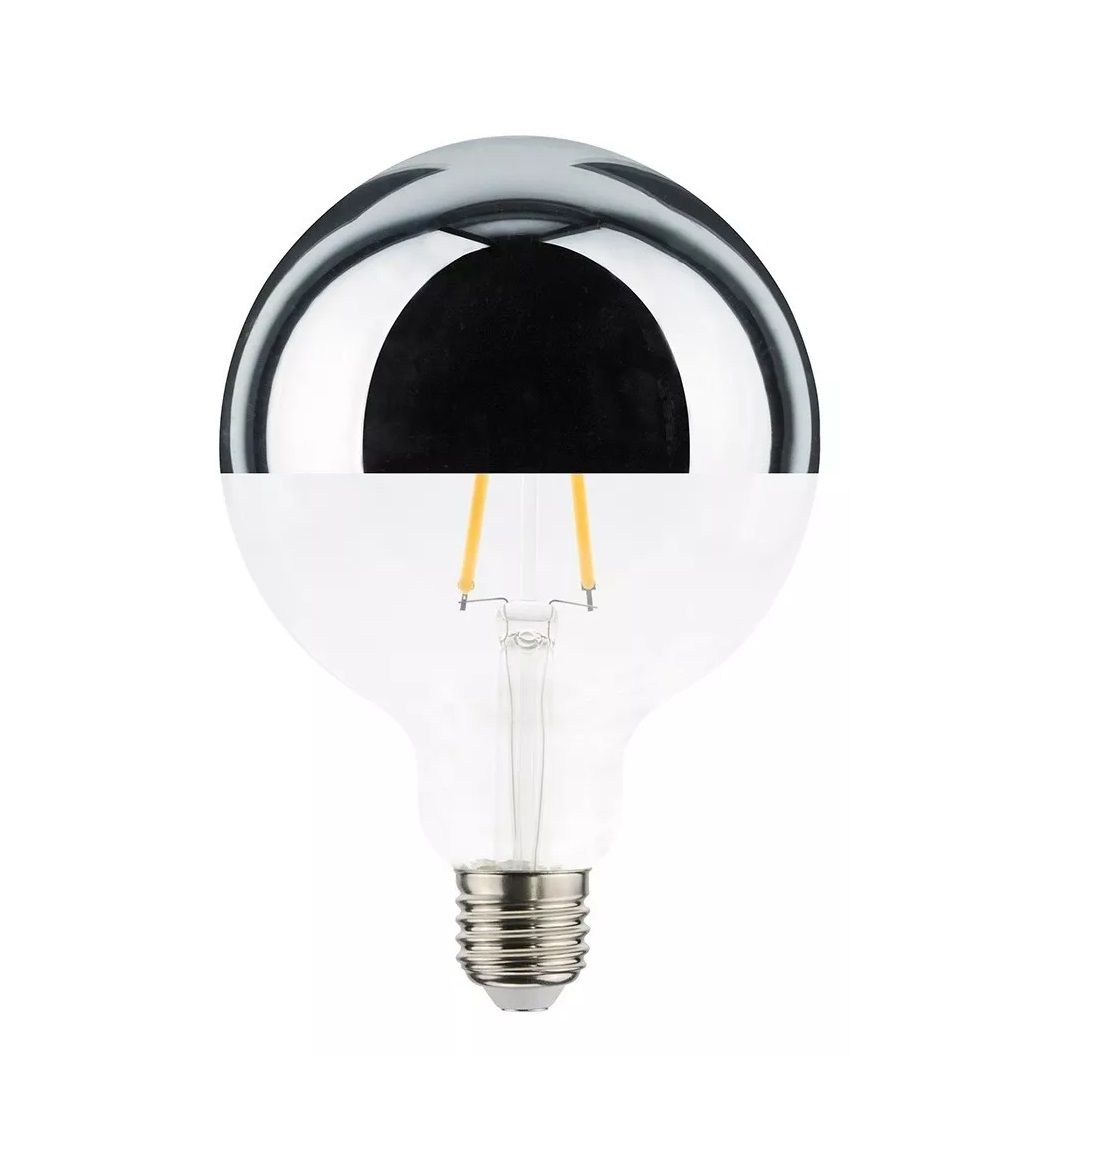 Lâmpada LED defletora G95 6w BIVOLT  - ZOLT luminárias